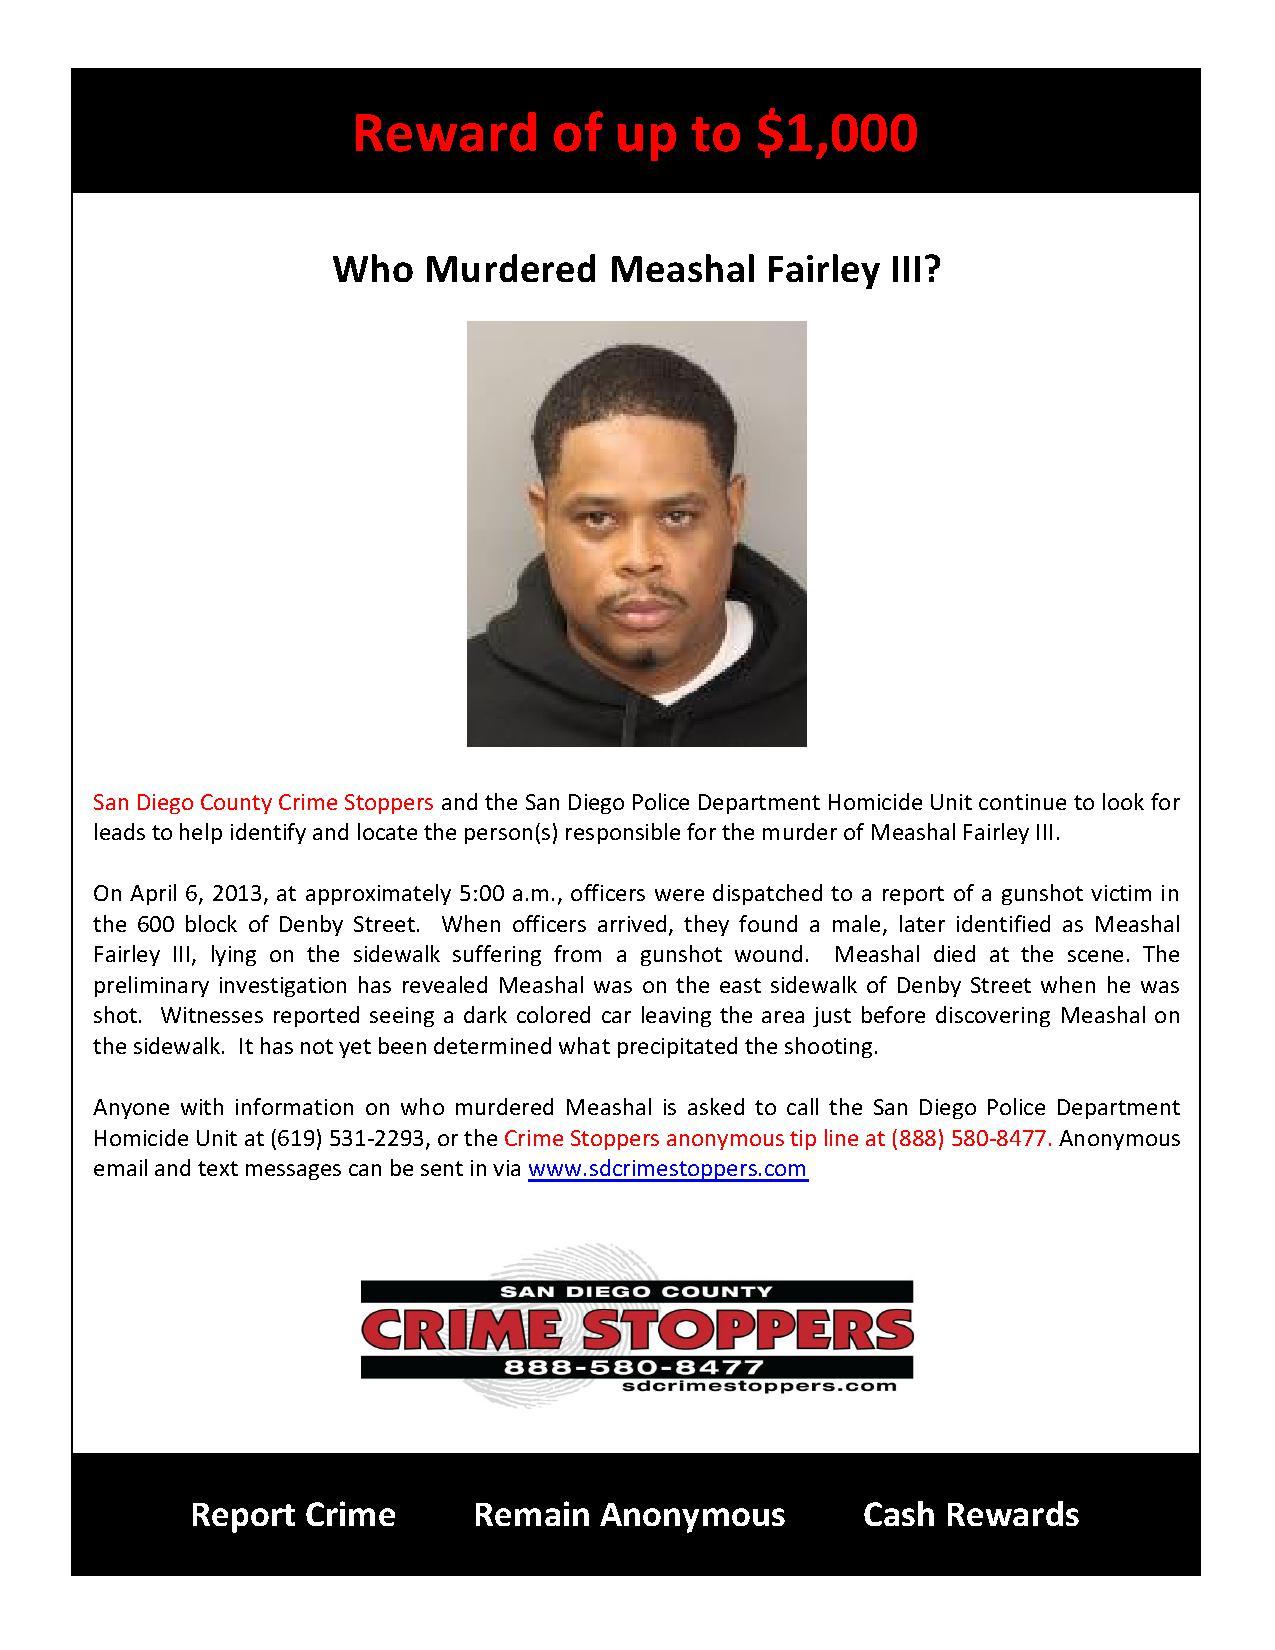 Who Murdered Meashal Fairley III_1